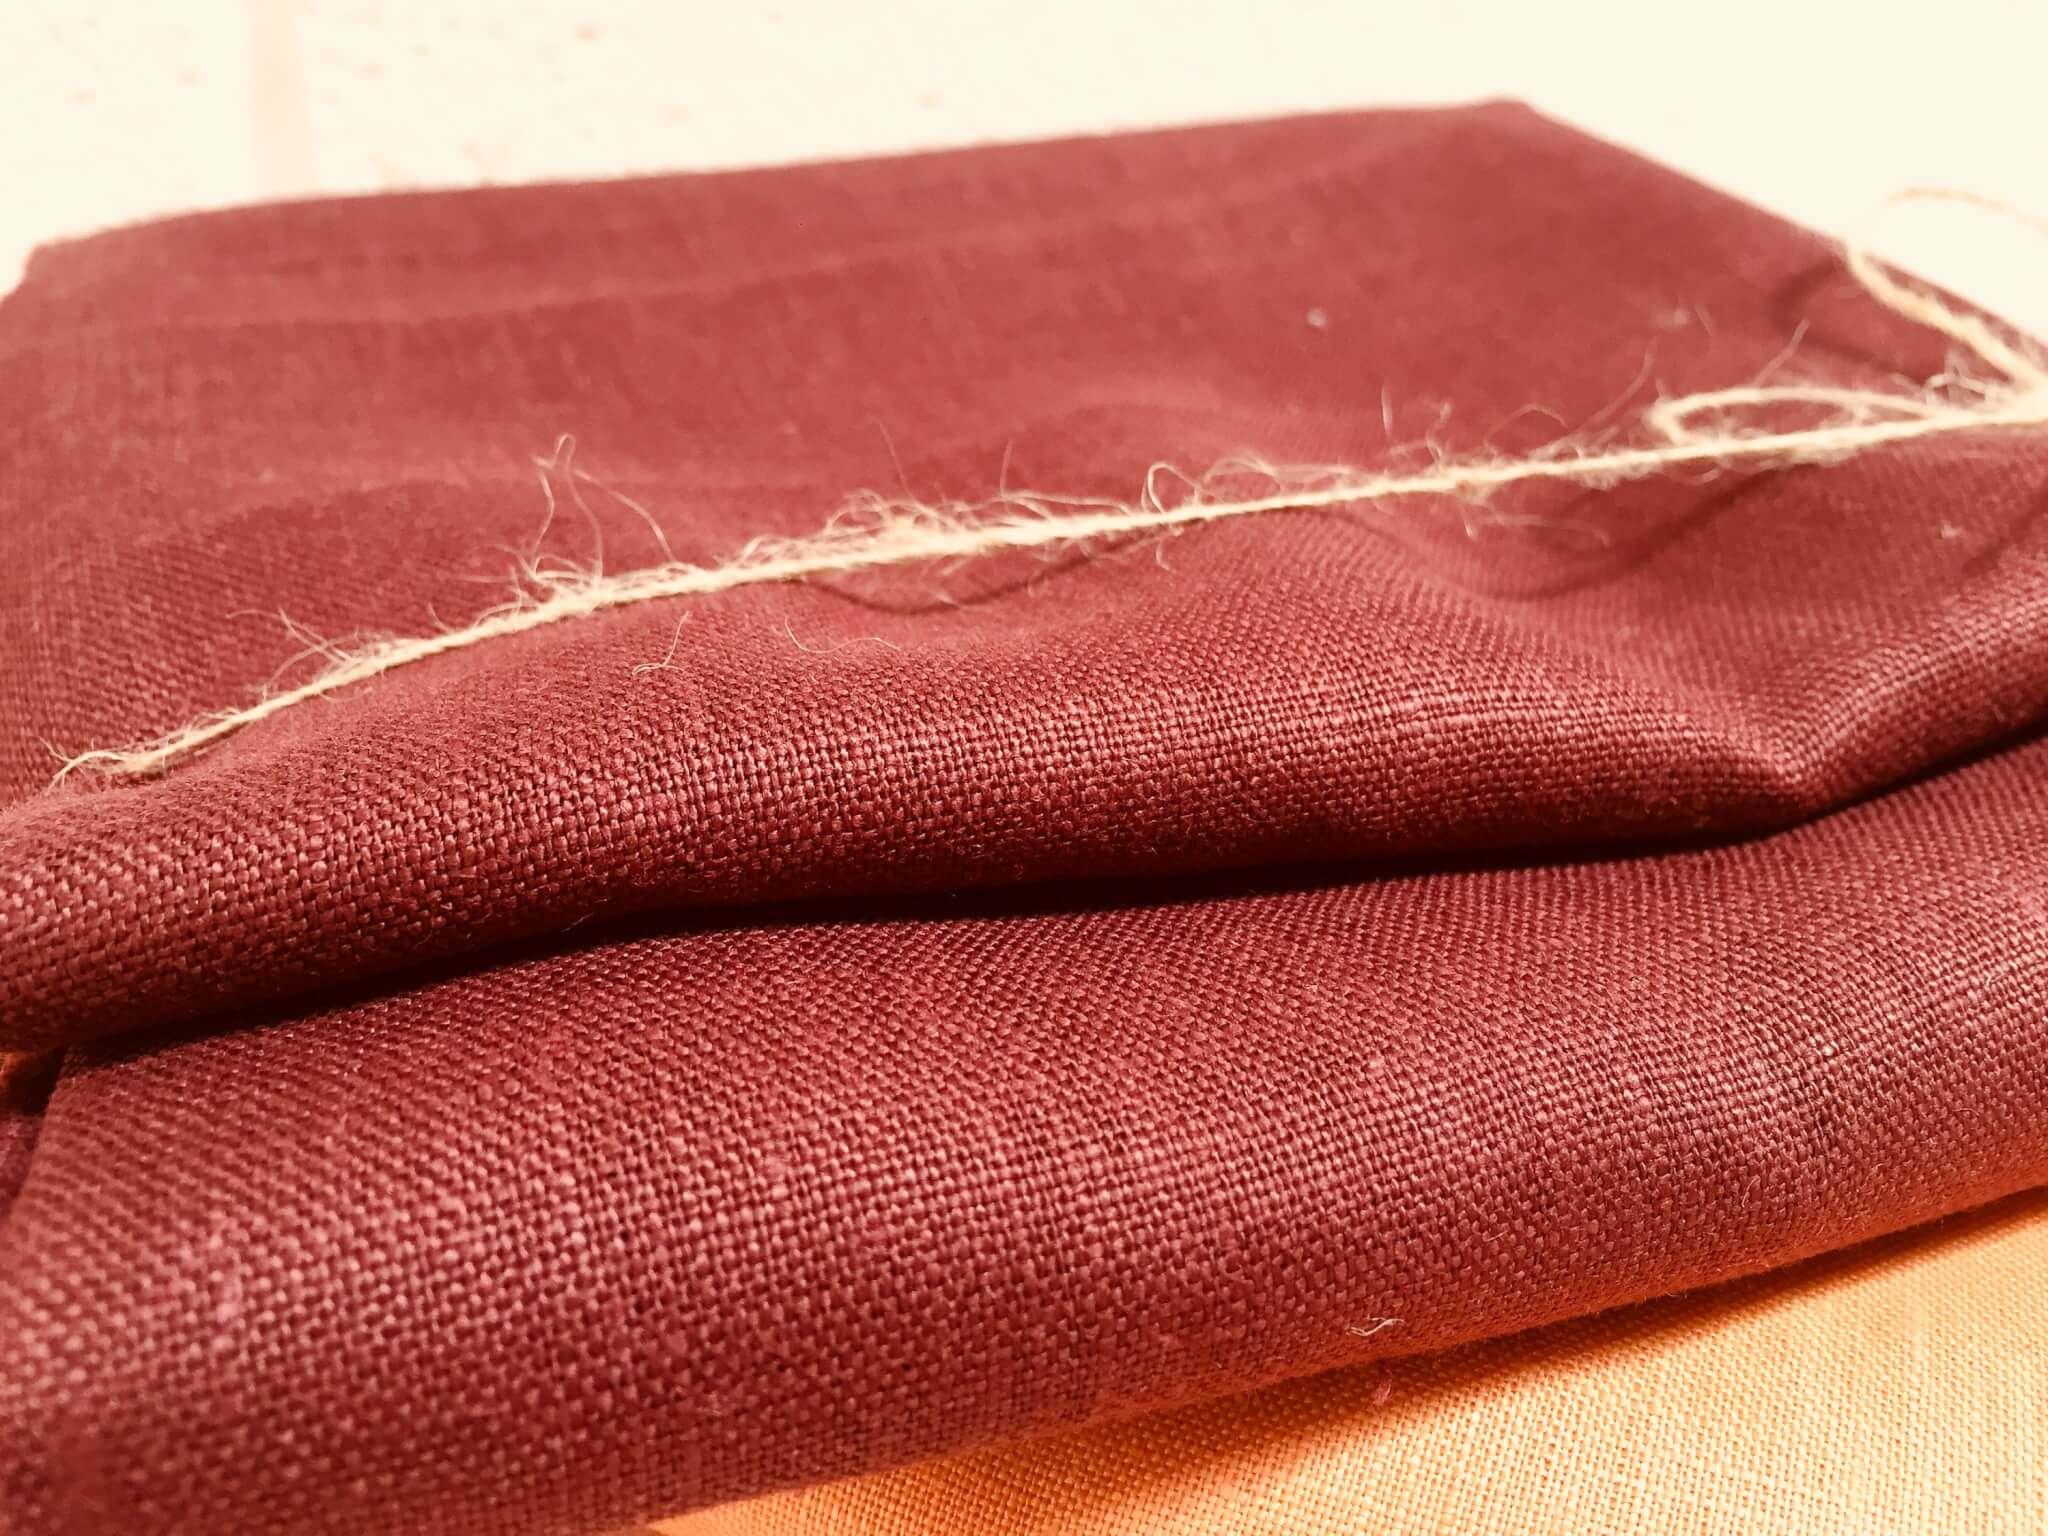 soft-linen-fabric-material-100-linens-textile-for-home-decor-curtains-clothes-140cm-wide-plain-burgundy-red-5d73f2e91.jpg